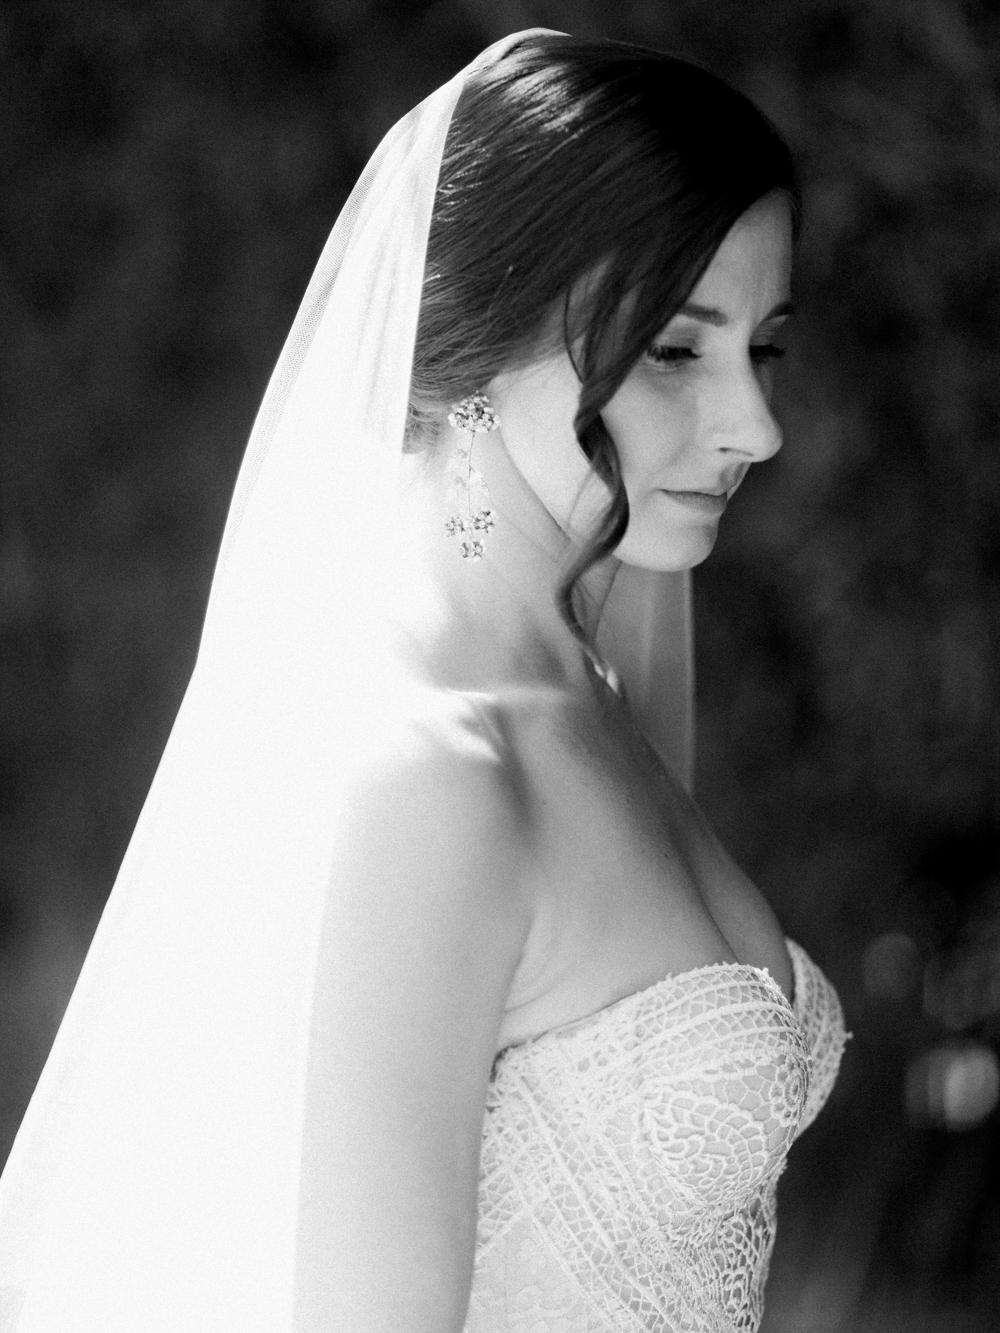 Christine Gosch - destination film photographer - houston wedding photographer - fine art film photographer - elopement photographer - destination wedding - understated wedding - simple beautiful wedding photography-63.jpg